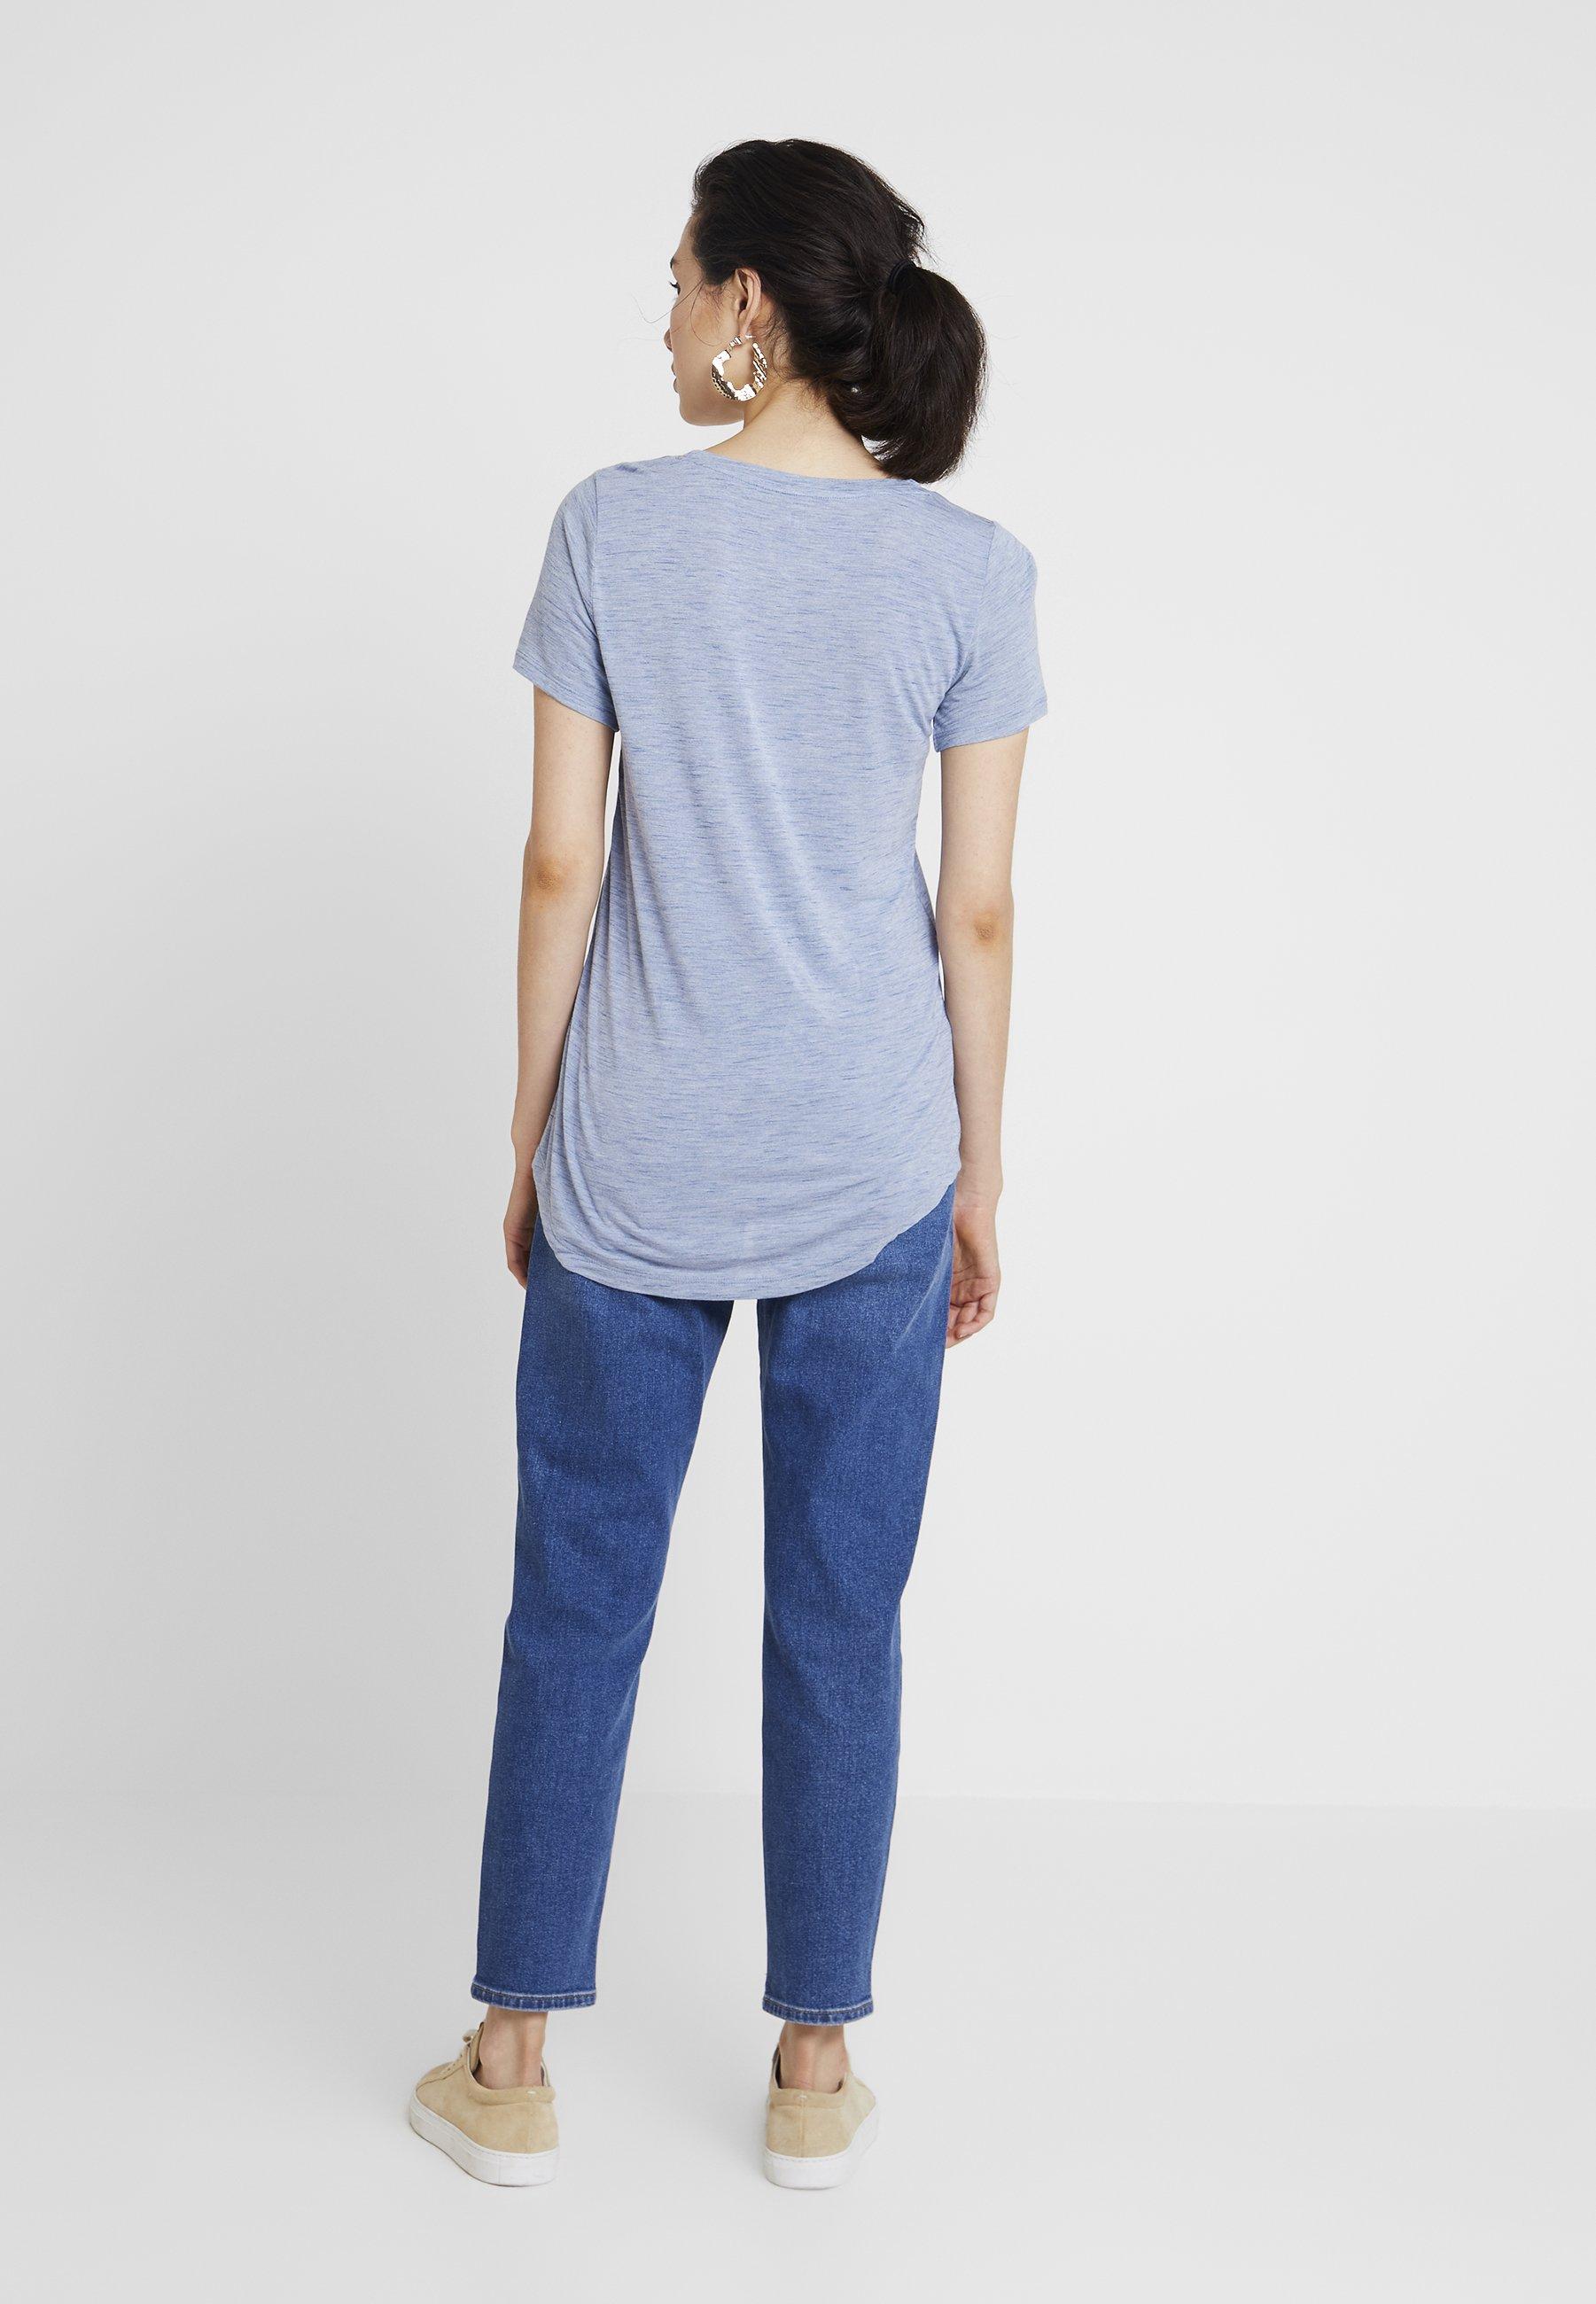 Gap Basique Blue LuxeT shirt Spacedye uPZwXOkTi